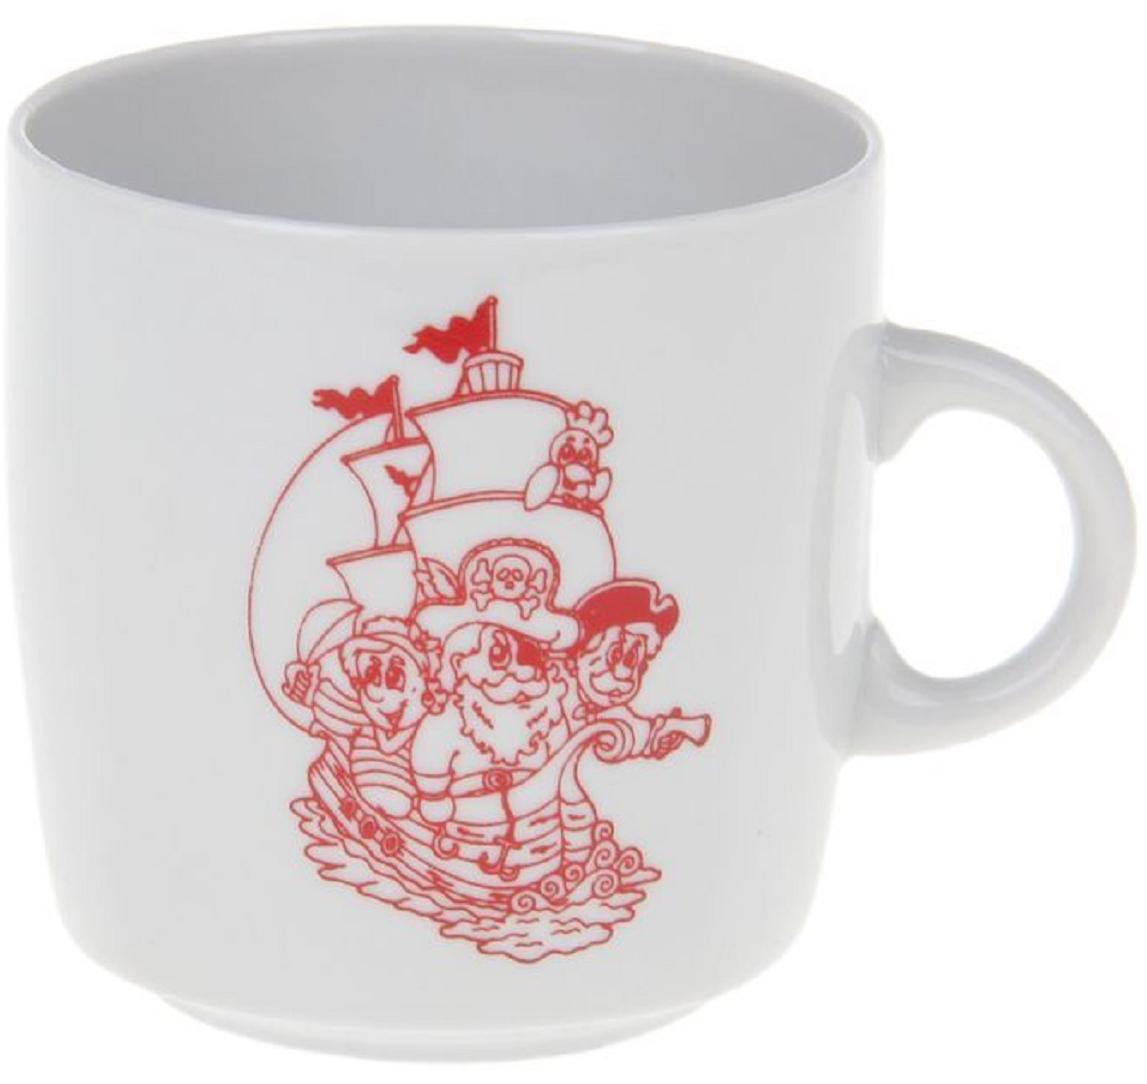 Кружка Фарфор Вербилок Пираты. 8713380 кружка фарфор вербилок знаки зодиака 250 мл